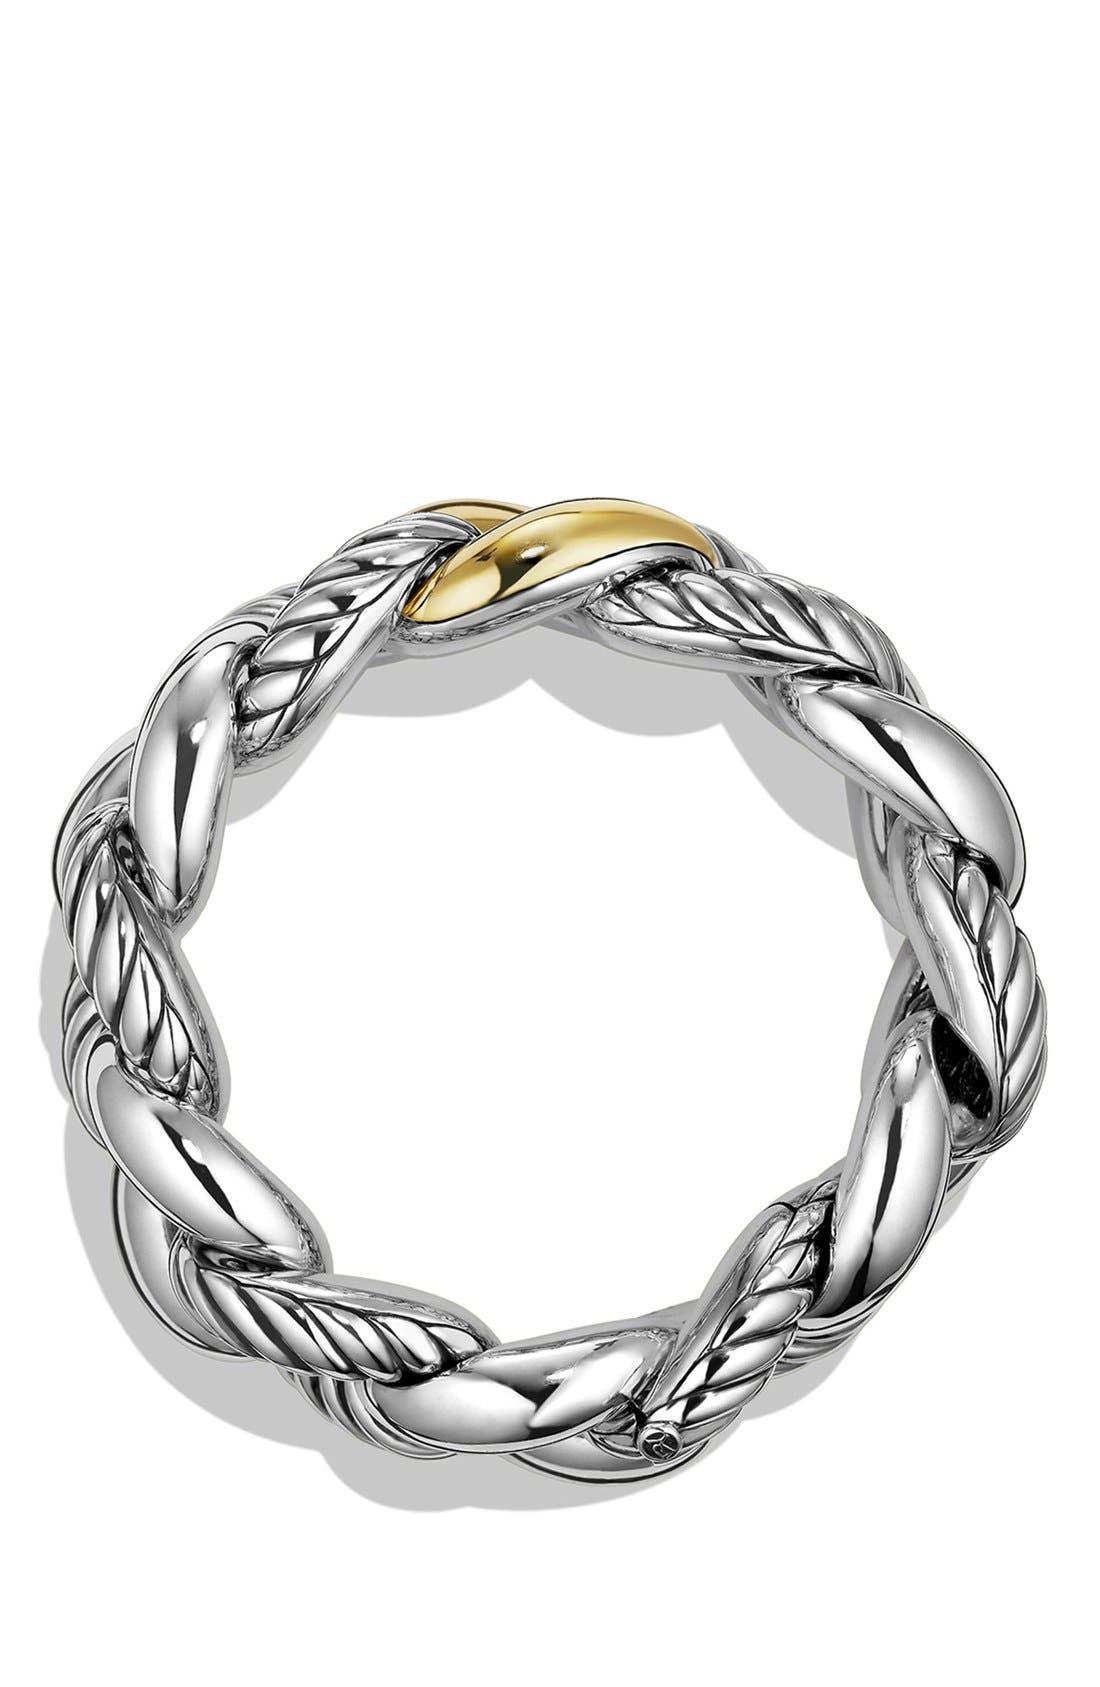 Alternate Image 2  - David Yurman 'Belmont' Curb Link Bracelet with 18K Gold